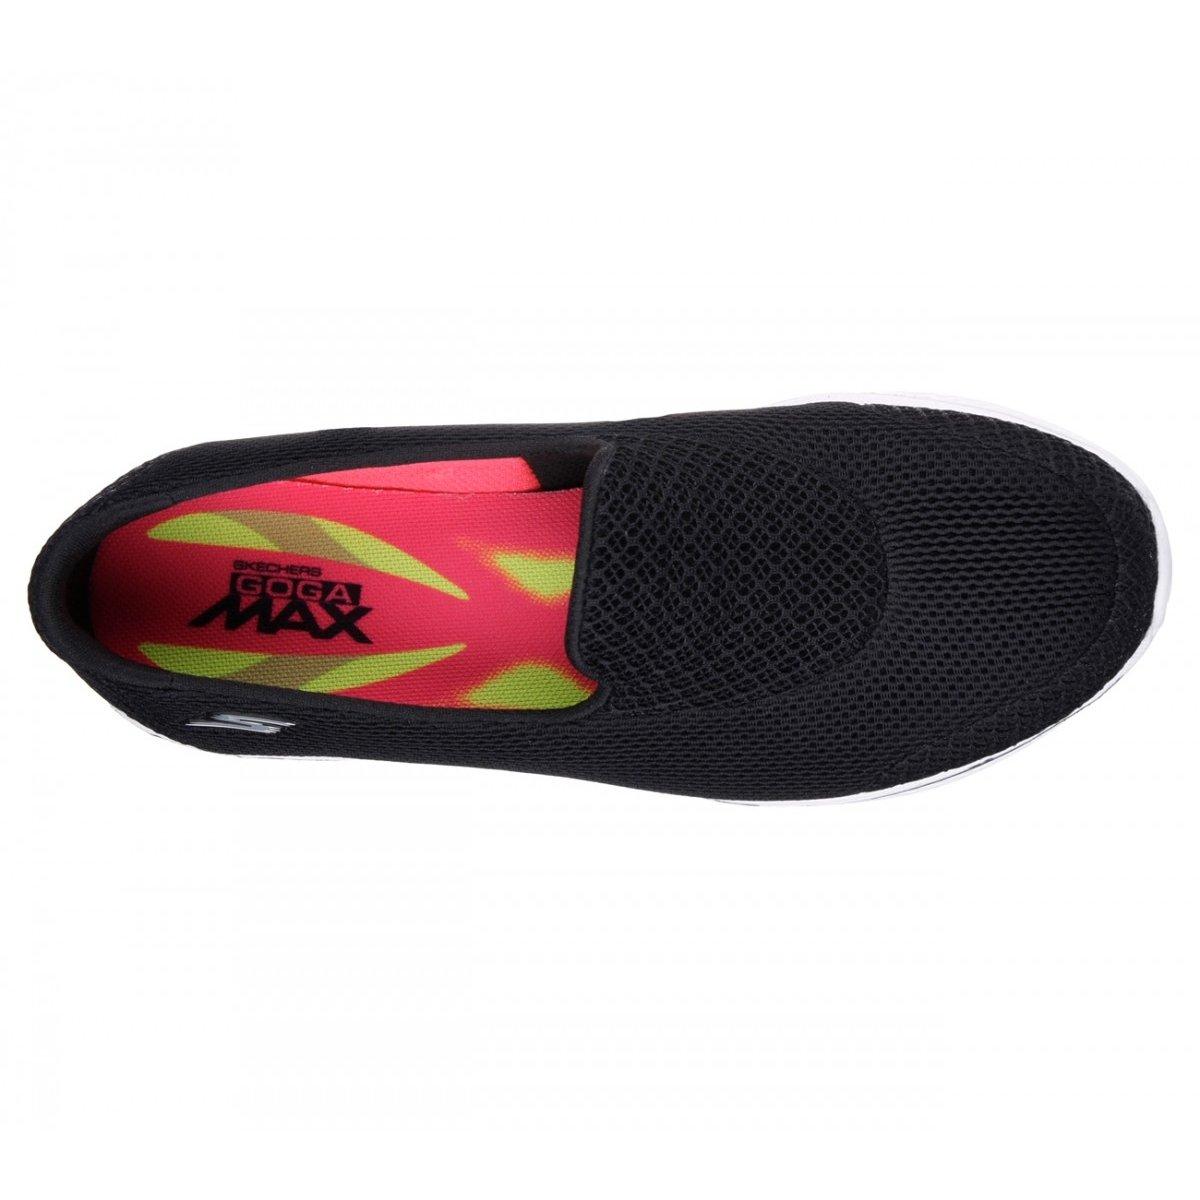 Feminino Skechers Tênis Preto 14170 Walk Go Propel Tênis Feminino 4 qwtCfxEw